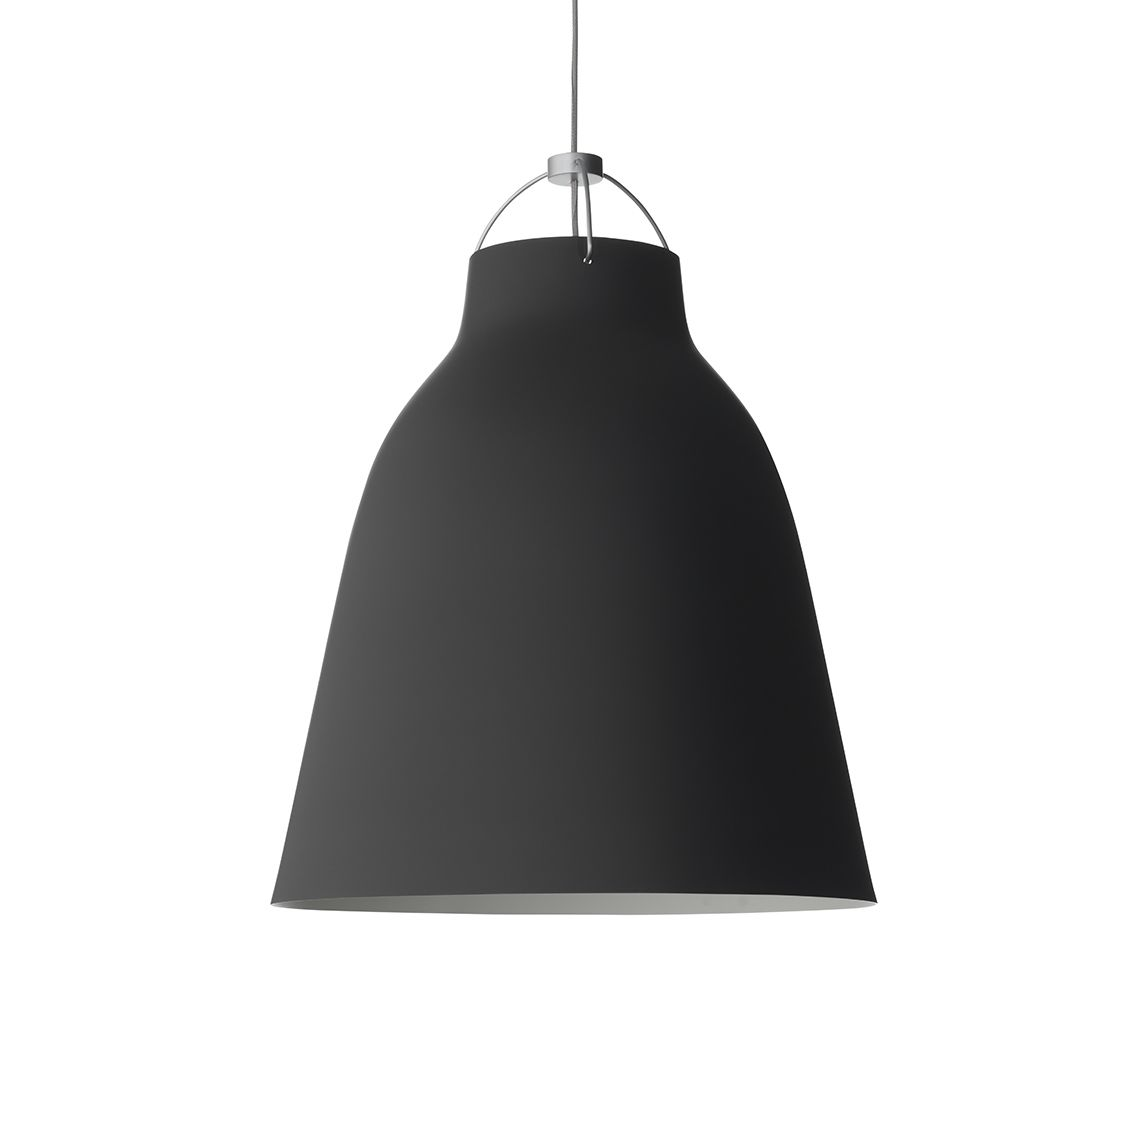 Caravaggio hanglamp Lightyears Ø26 mat zwart